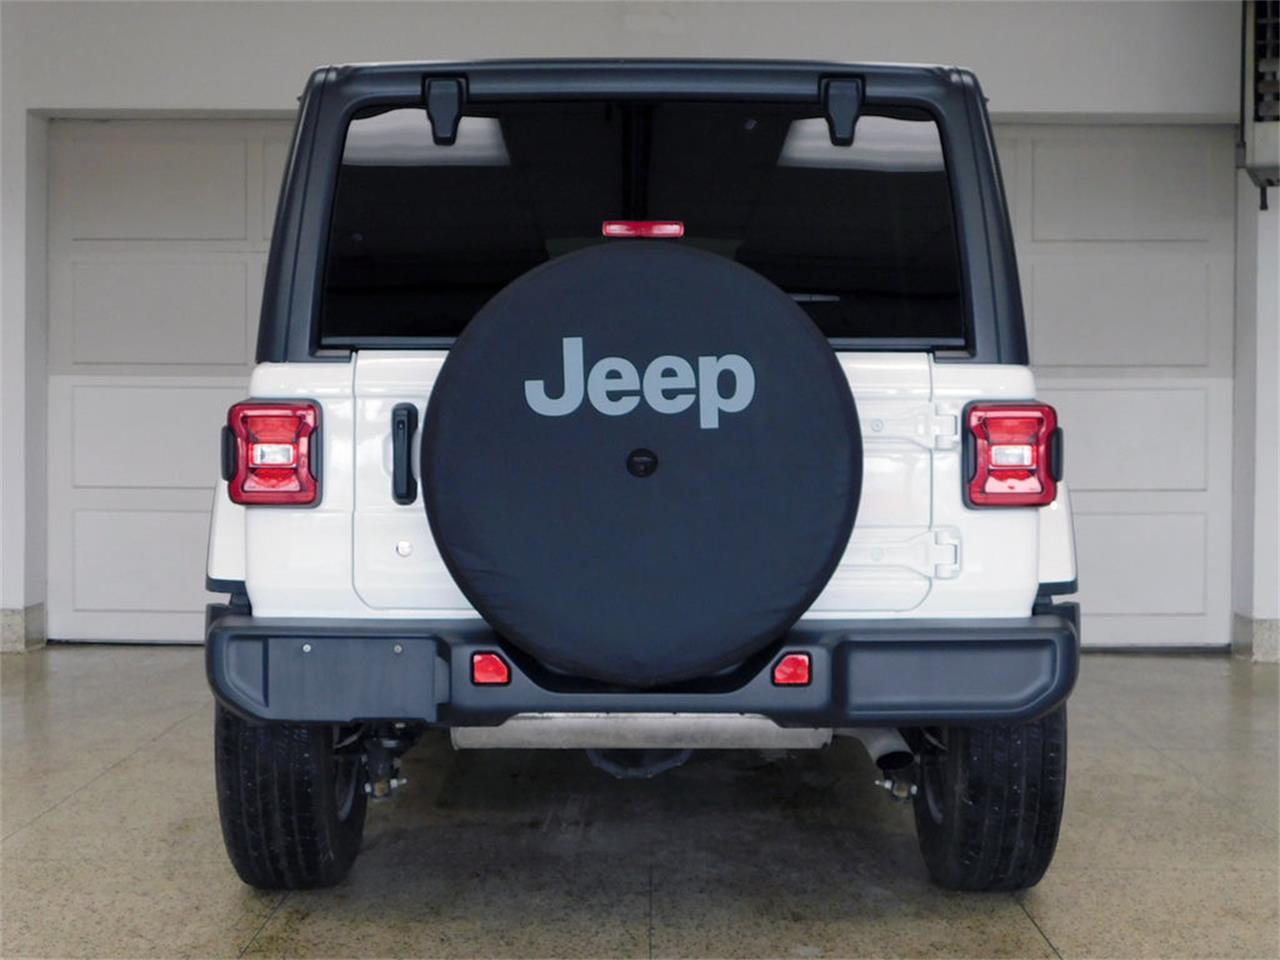 2018 Jeep Wrangler (CC-1336563) for sale in Hamburg, New York